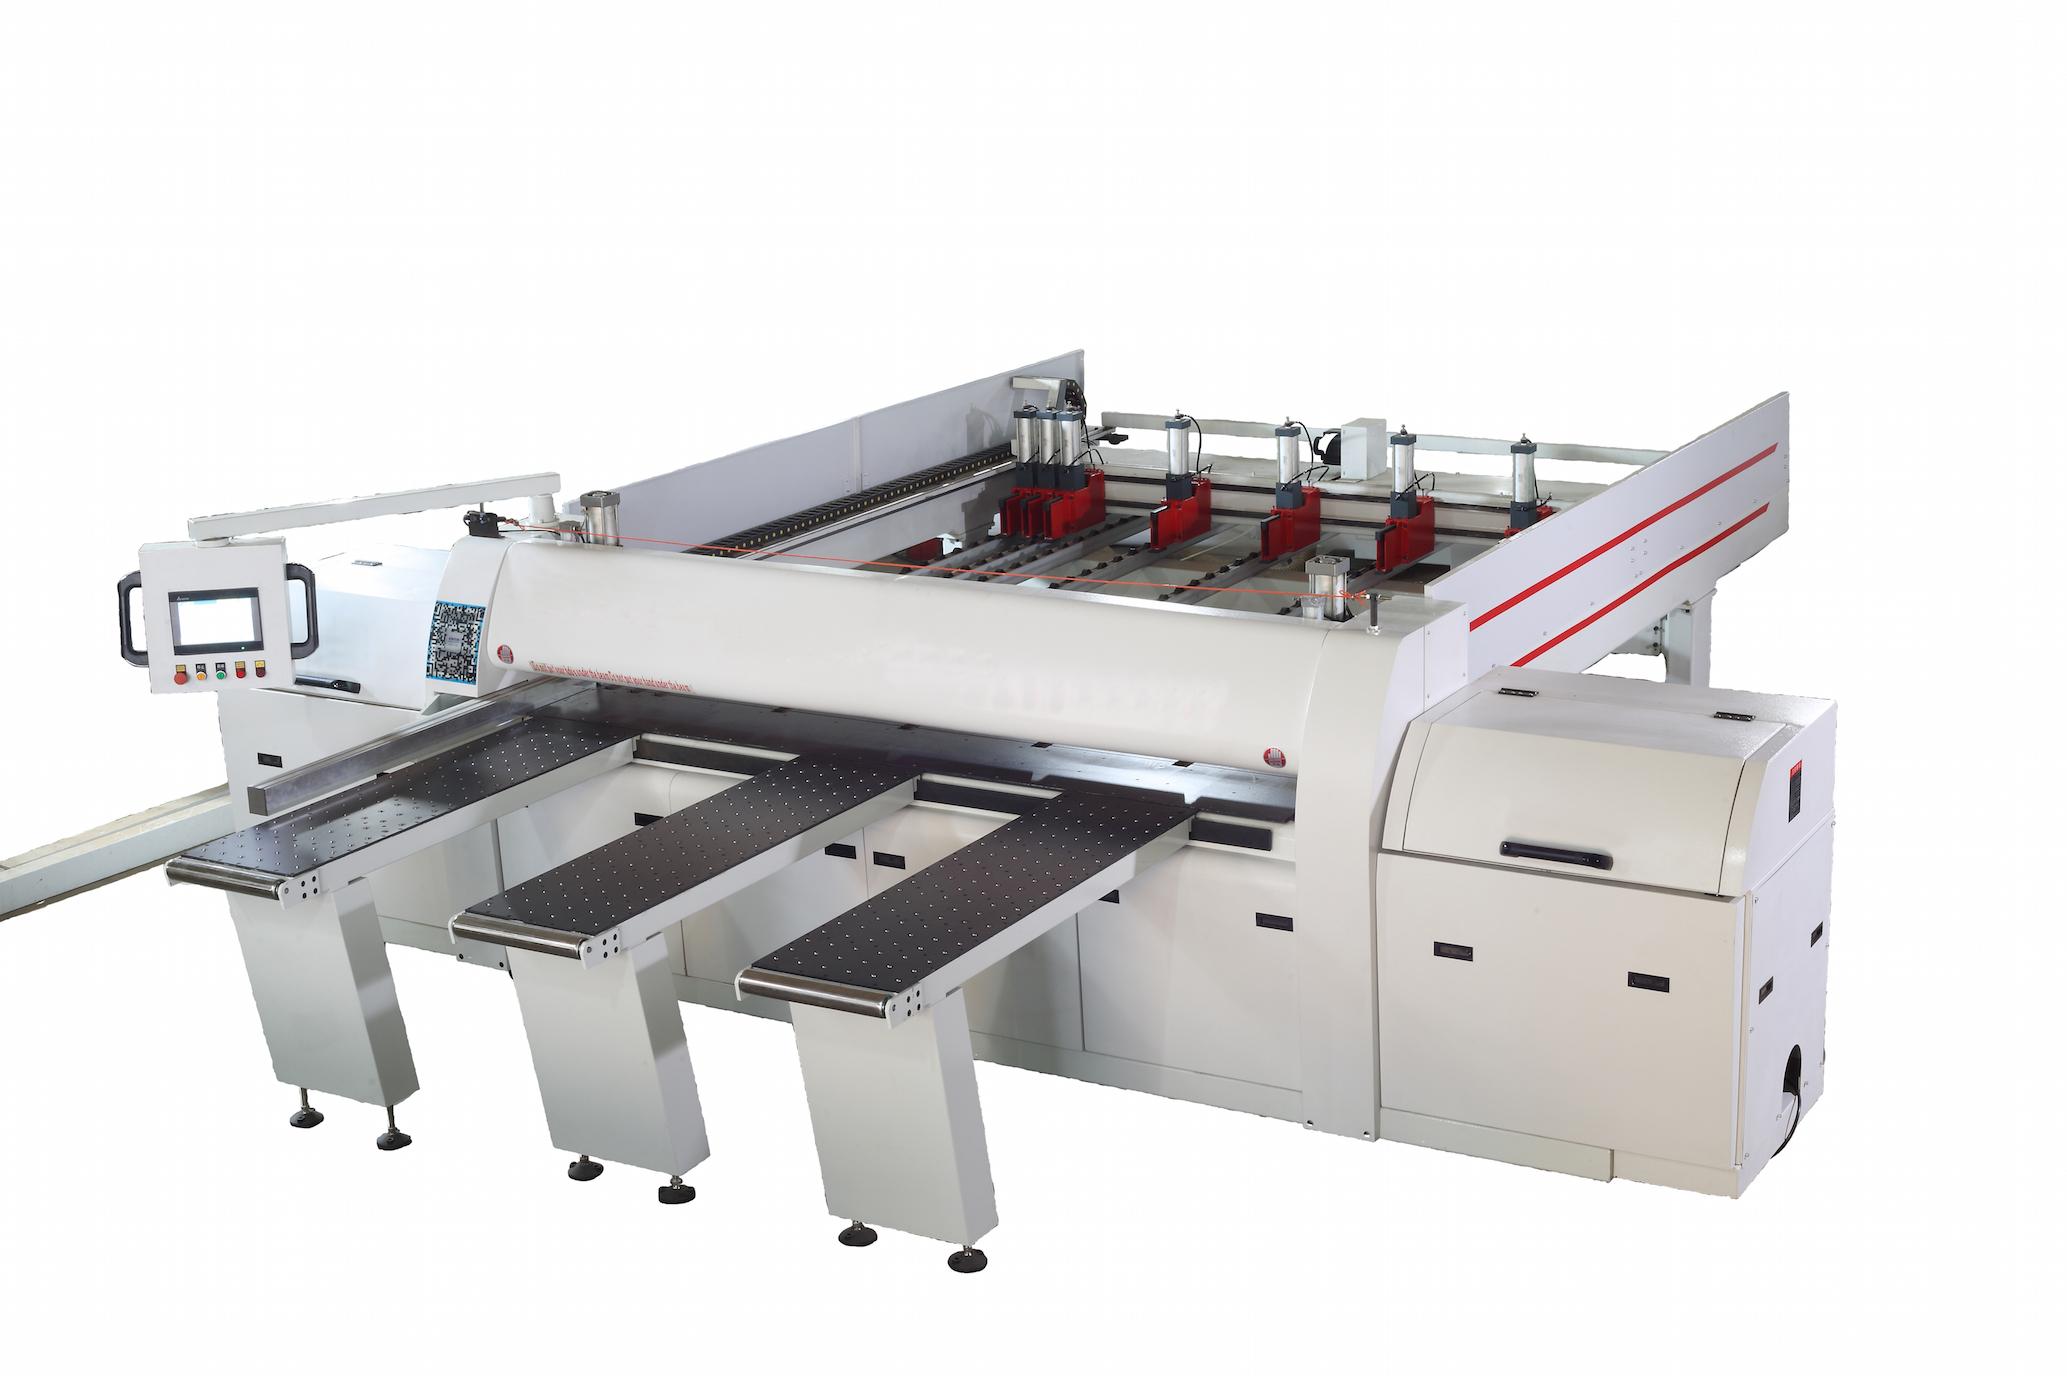 MJP270F CNC panel saw